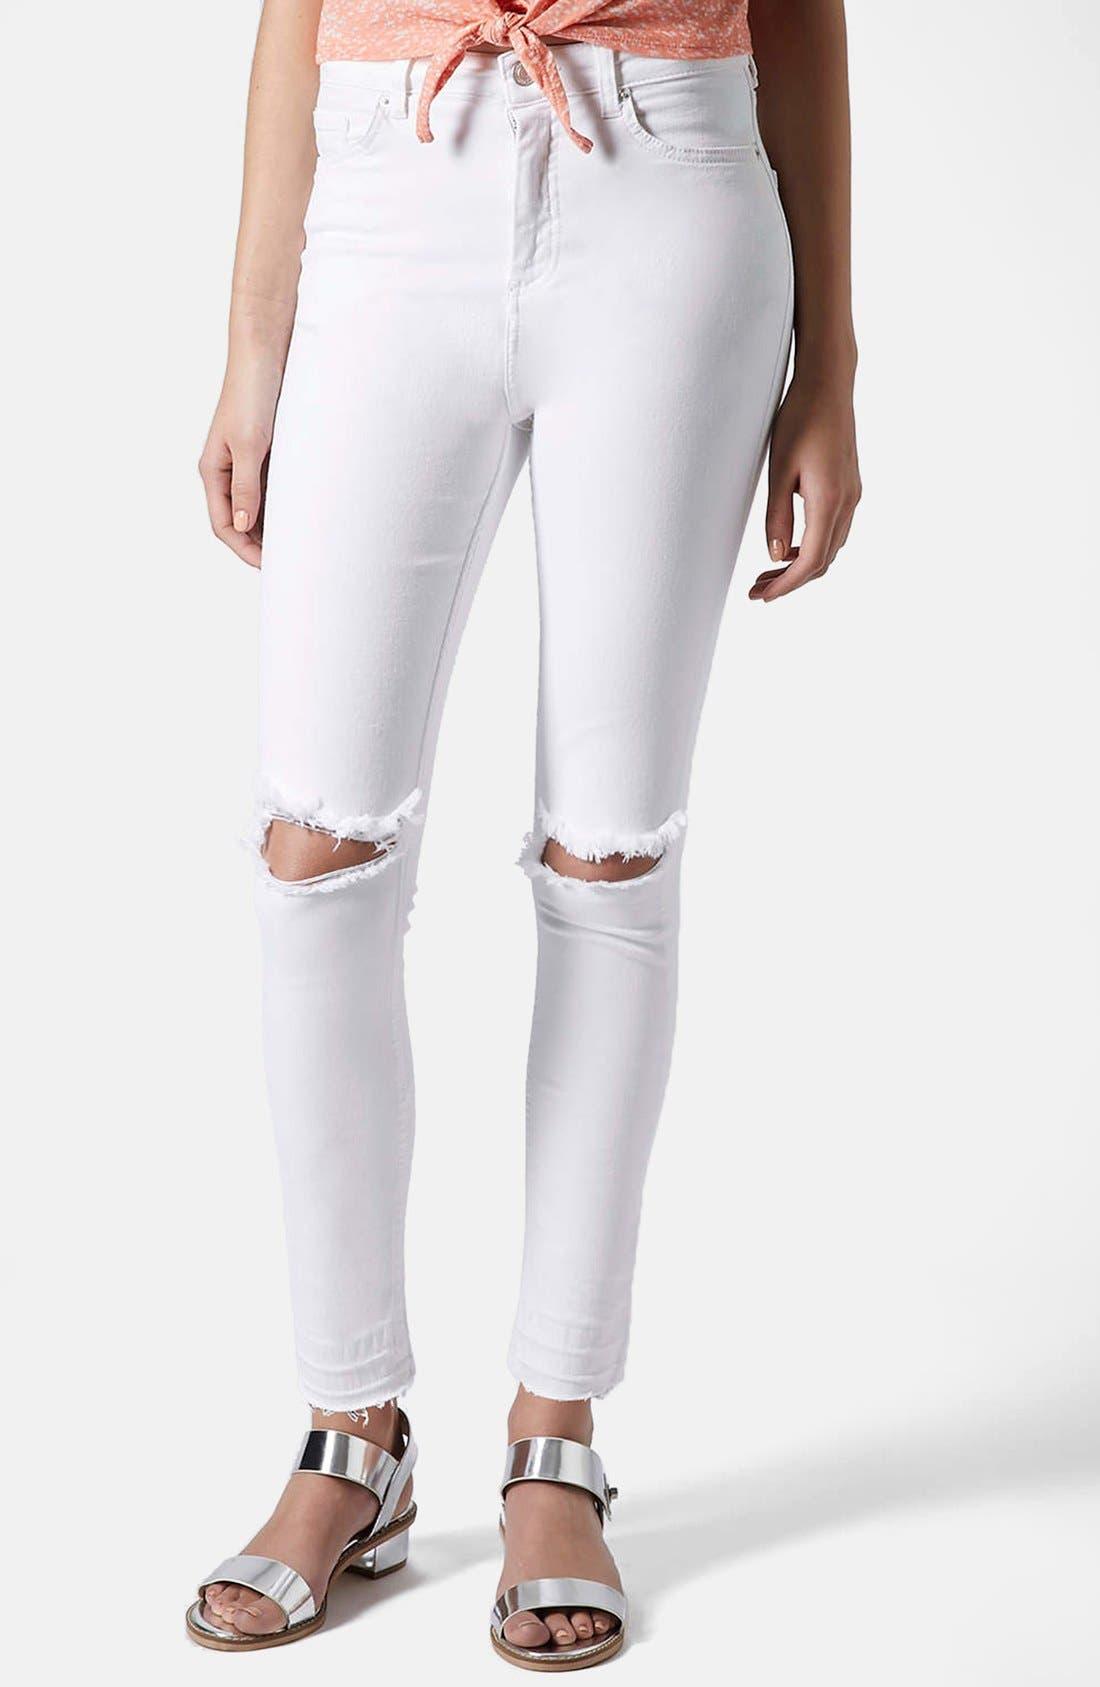 Main Image - Topshop Moto 'Jamie' Ripped High Rise Ankle Skinny Jeans (White) (Regular & Short)